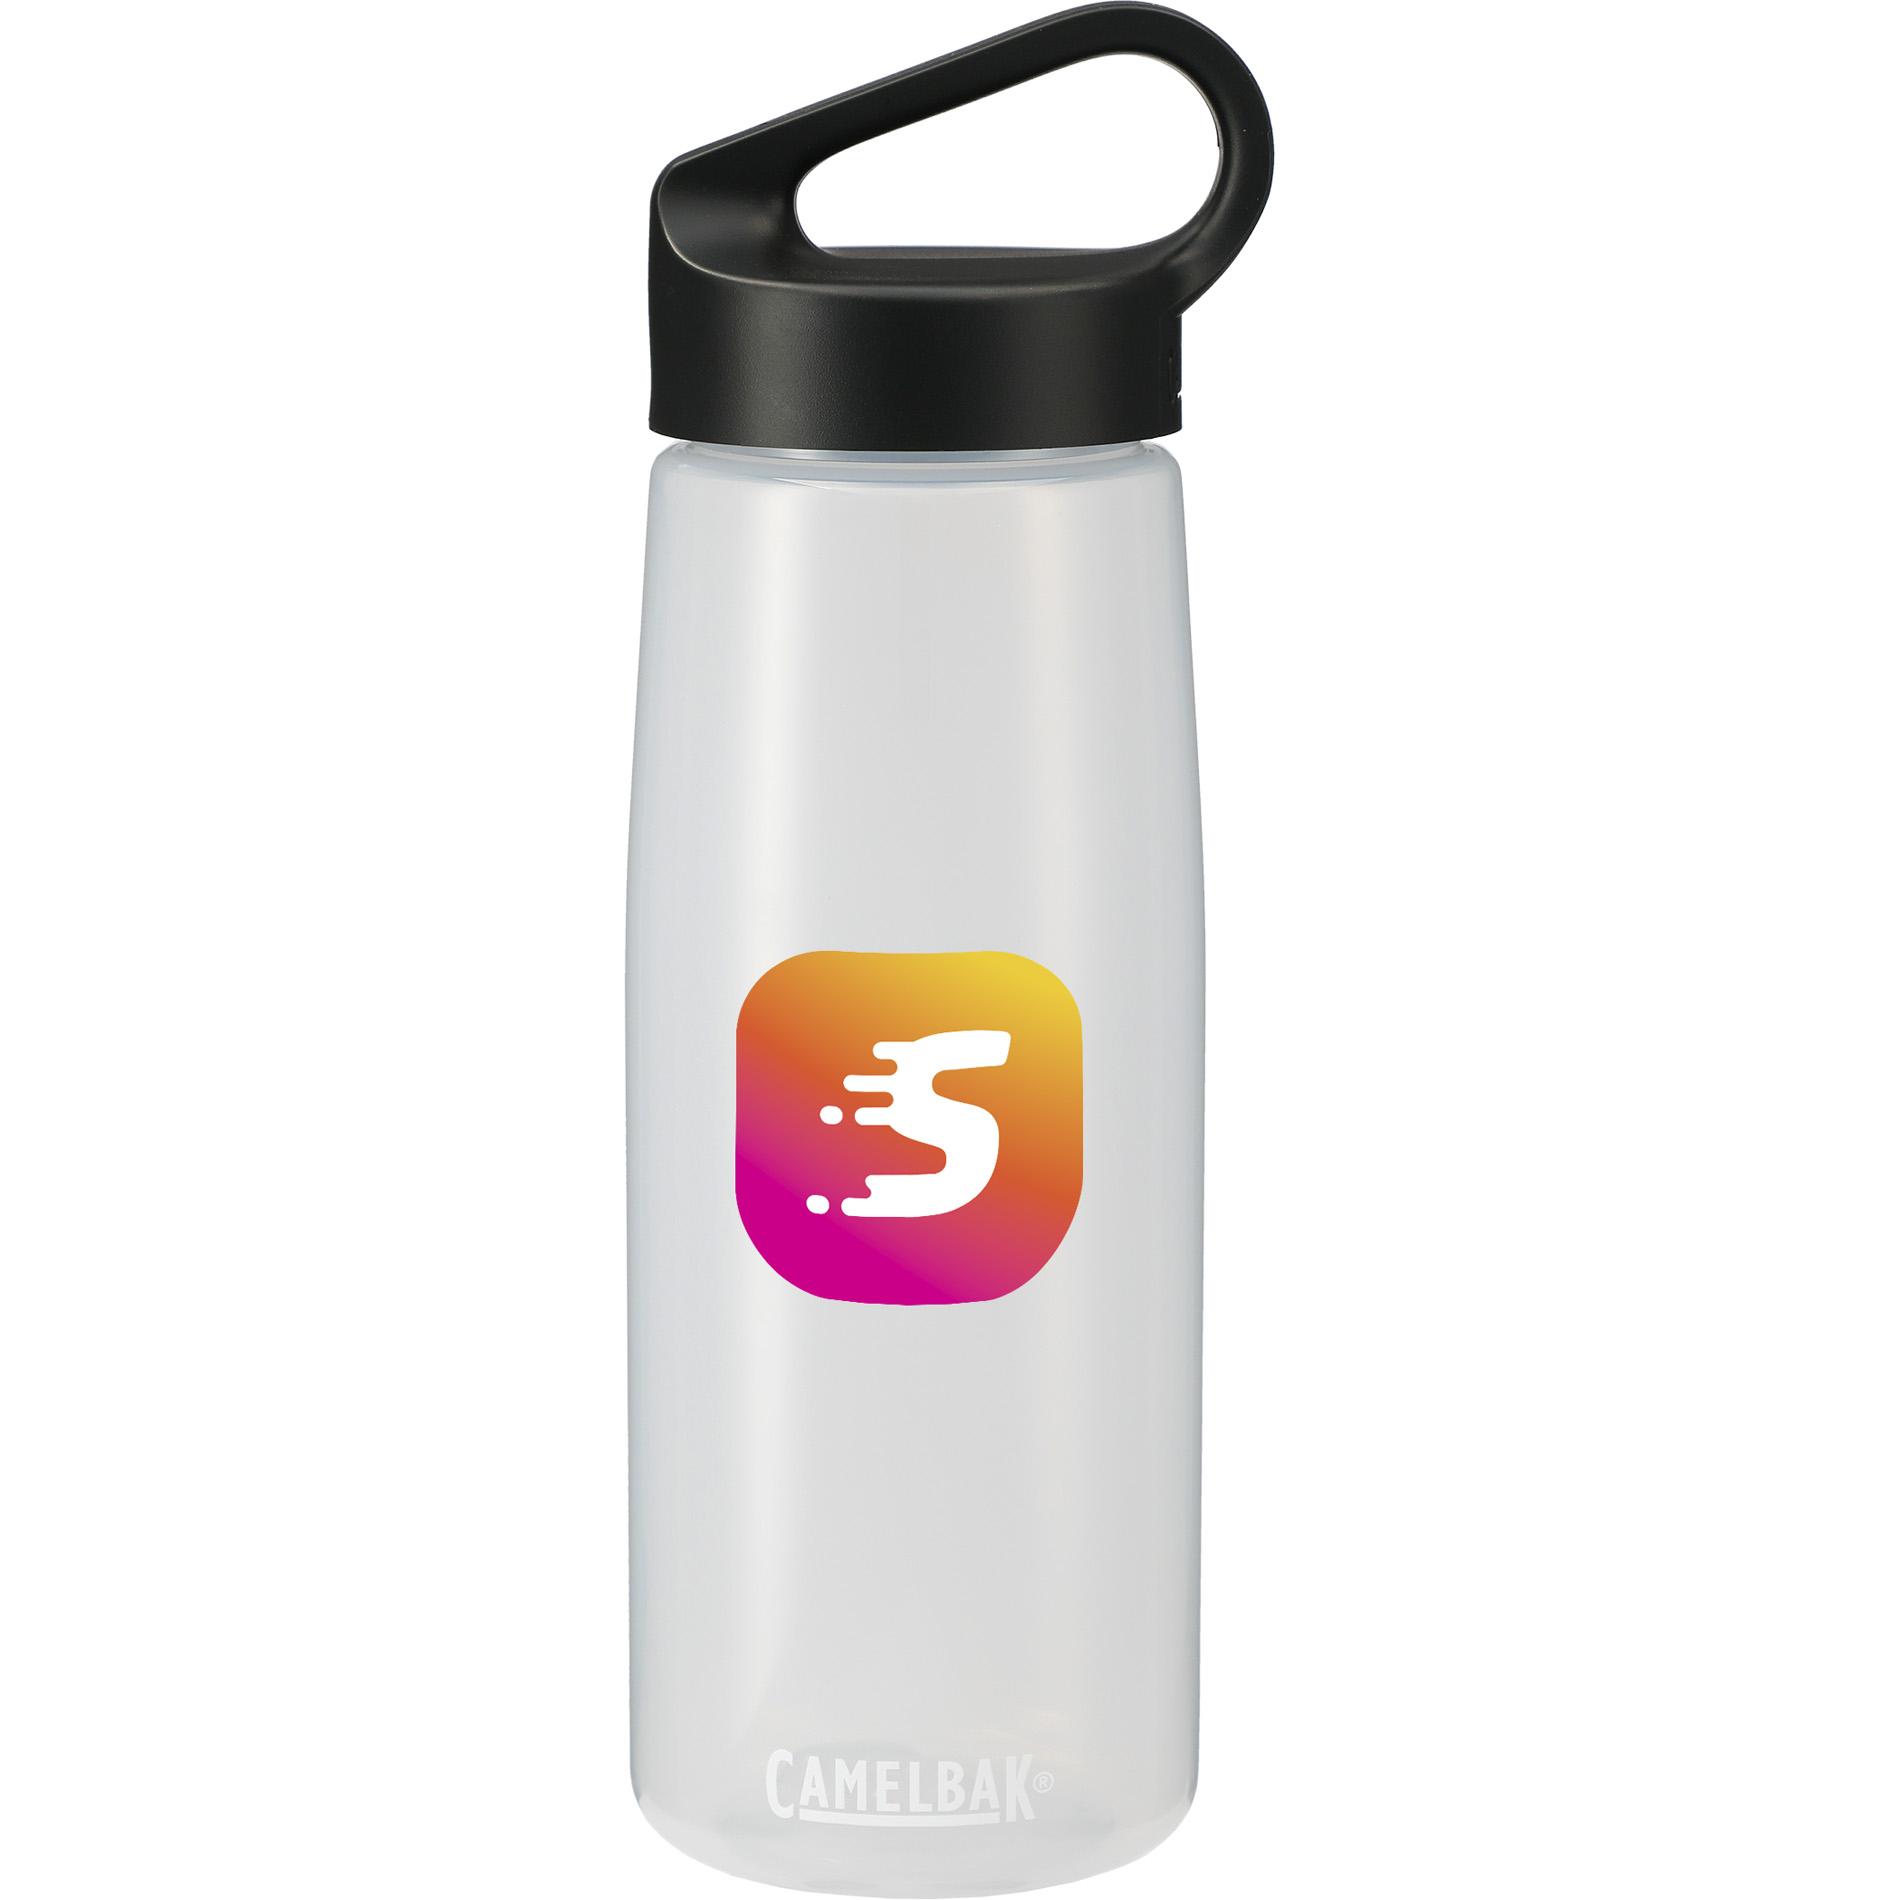 CamelBak Pivot Echo Water Bottle